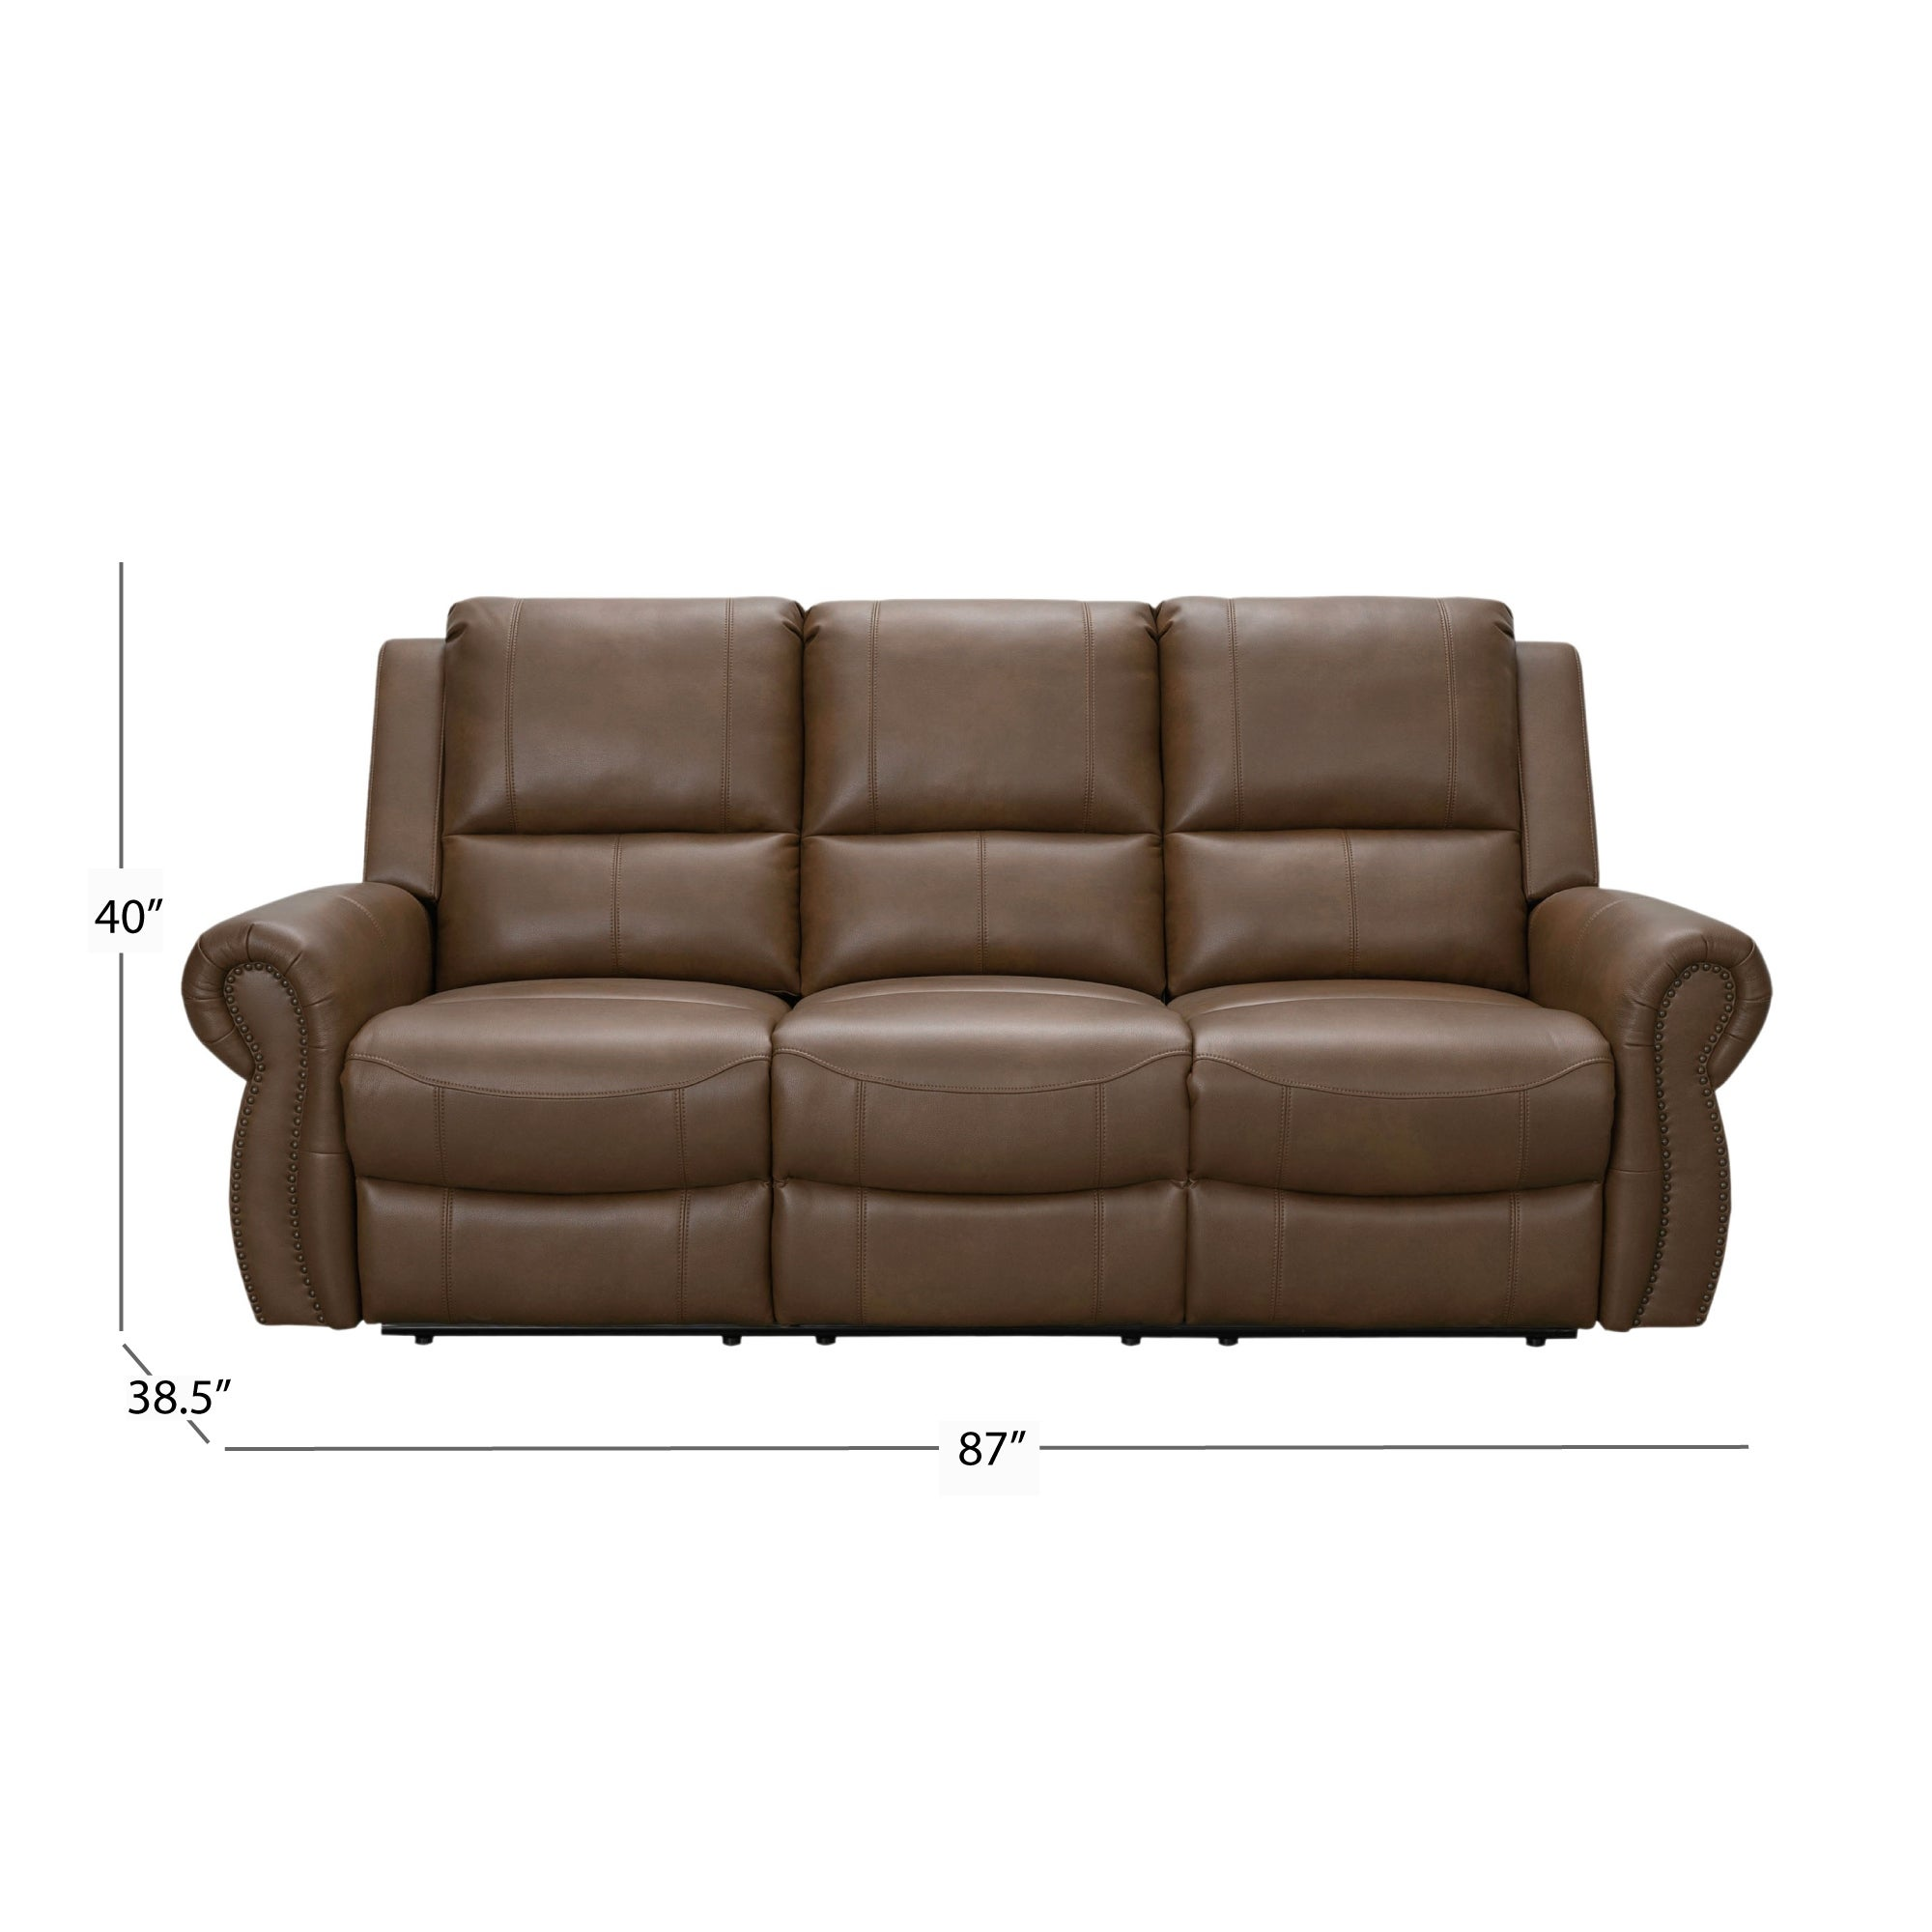 Abbyson Skyler Cognac 2 Piece Leather Reclining Living Room Set Overstock 12382271